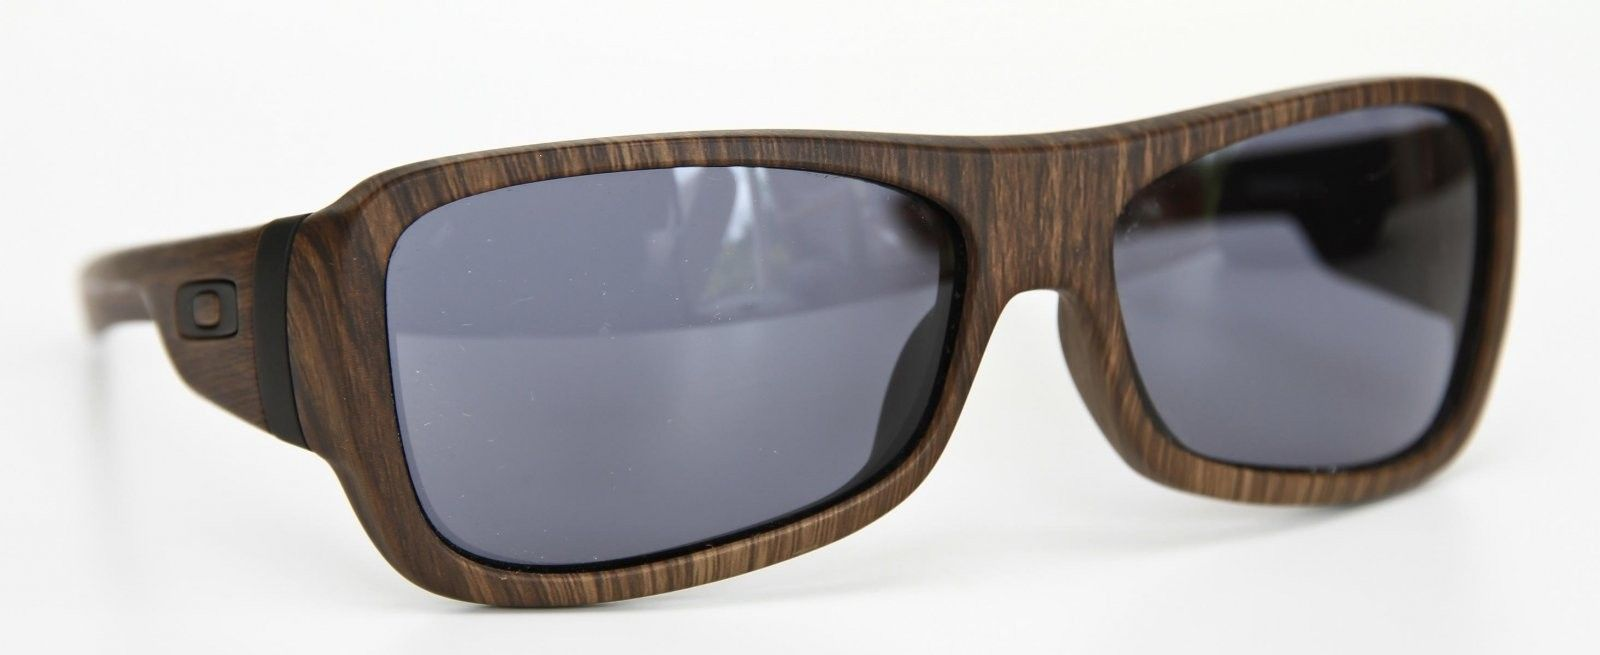 My Little Oakley Collection - K1600_IMG_2602.JPG